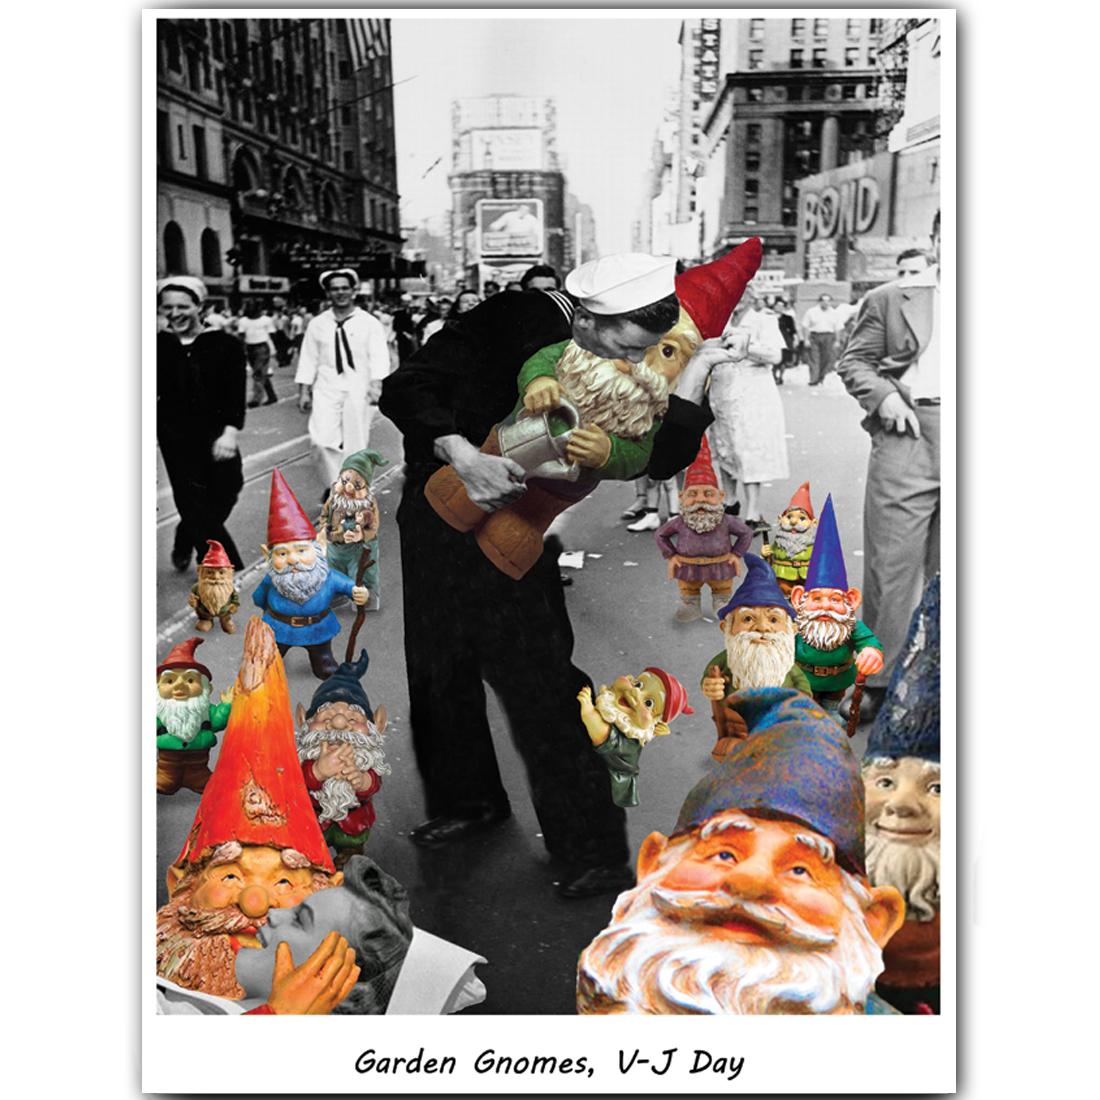 Garden Gnomes V-J Day